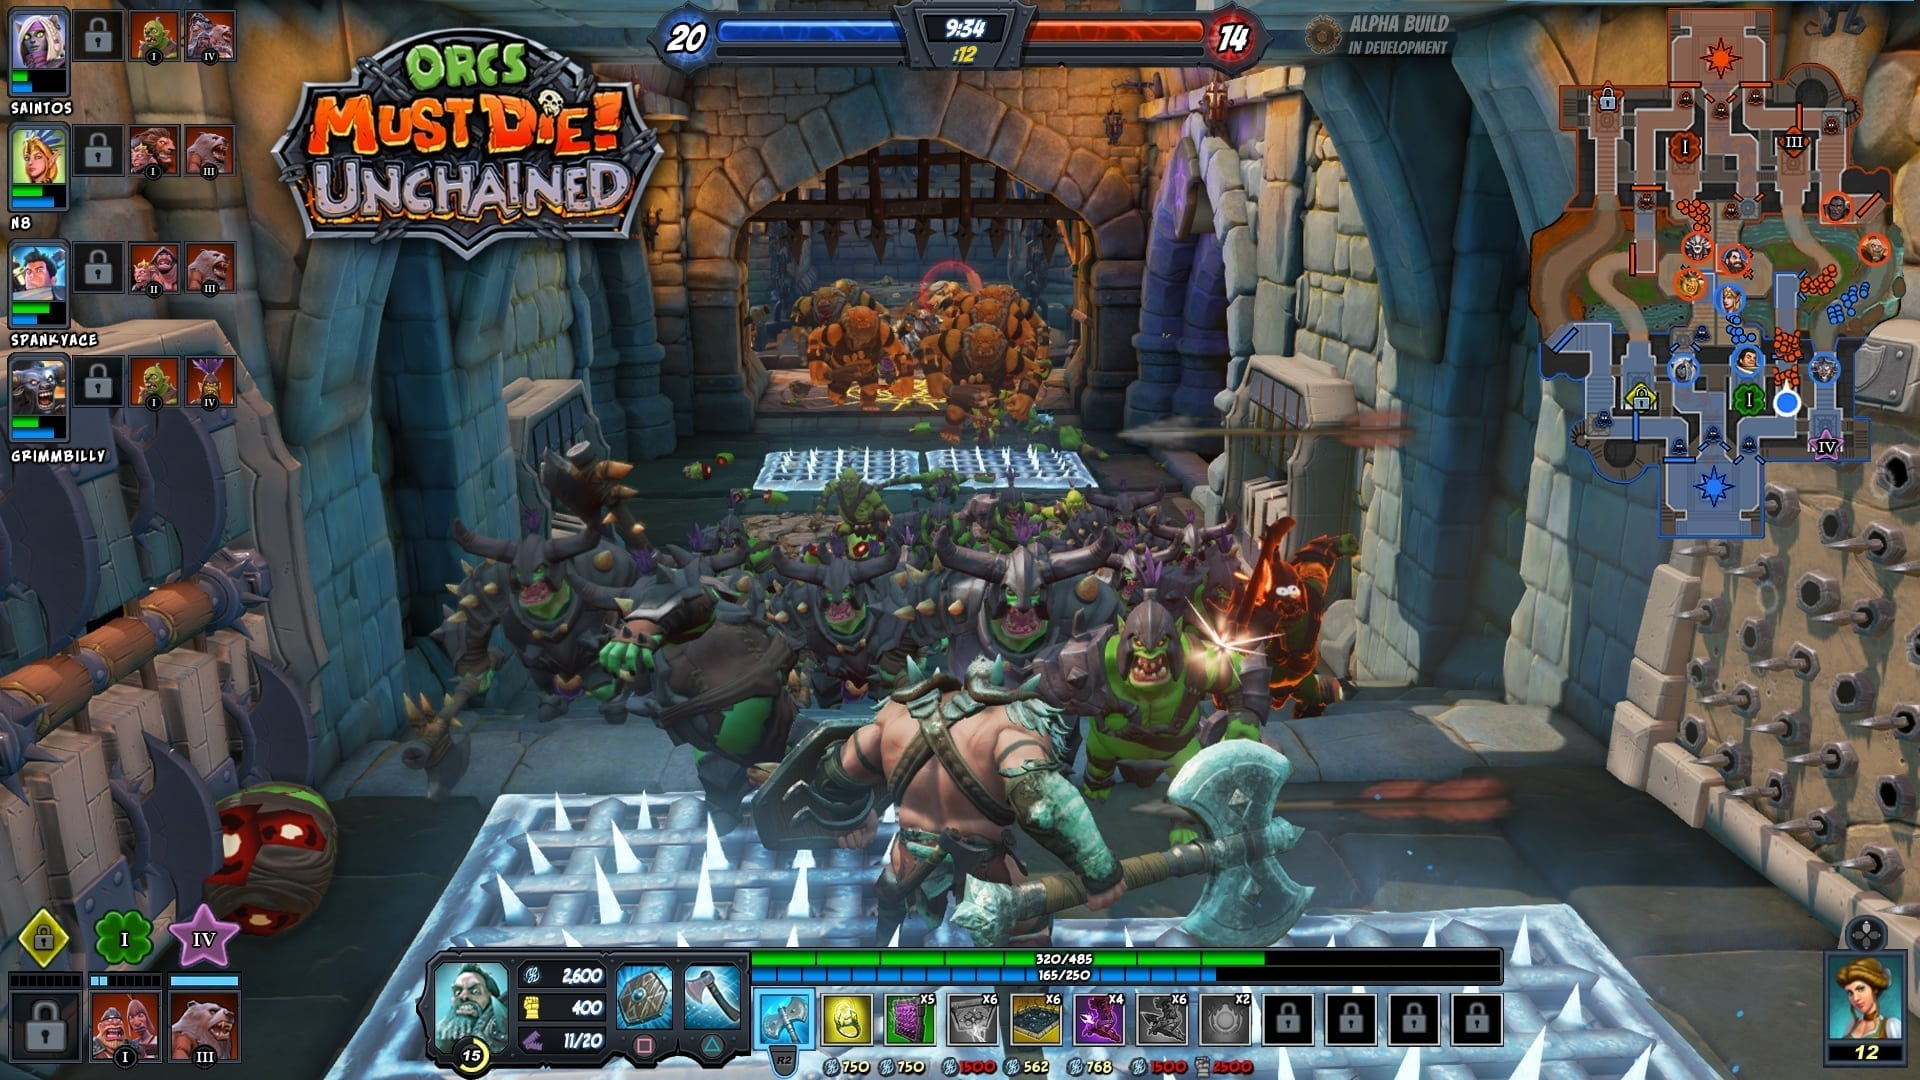 Orcs Must Die Unchained screenshot 5